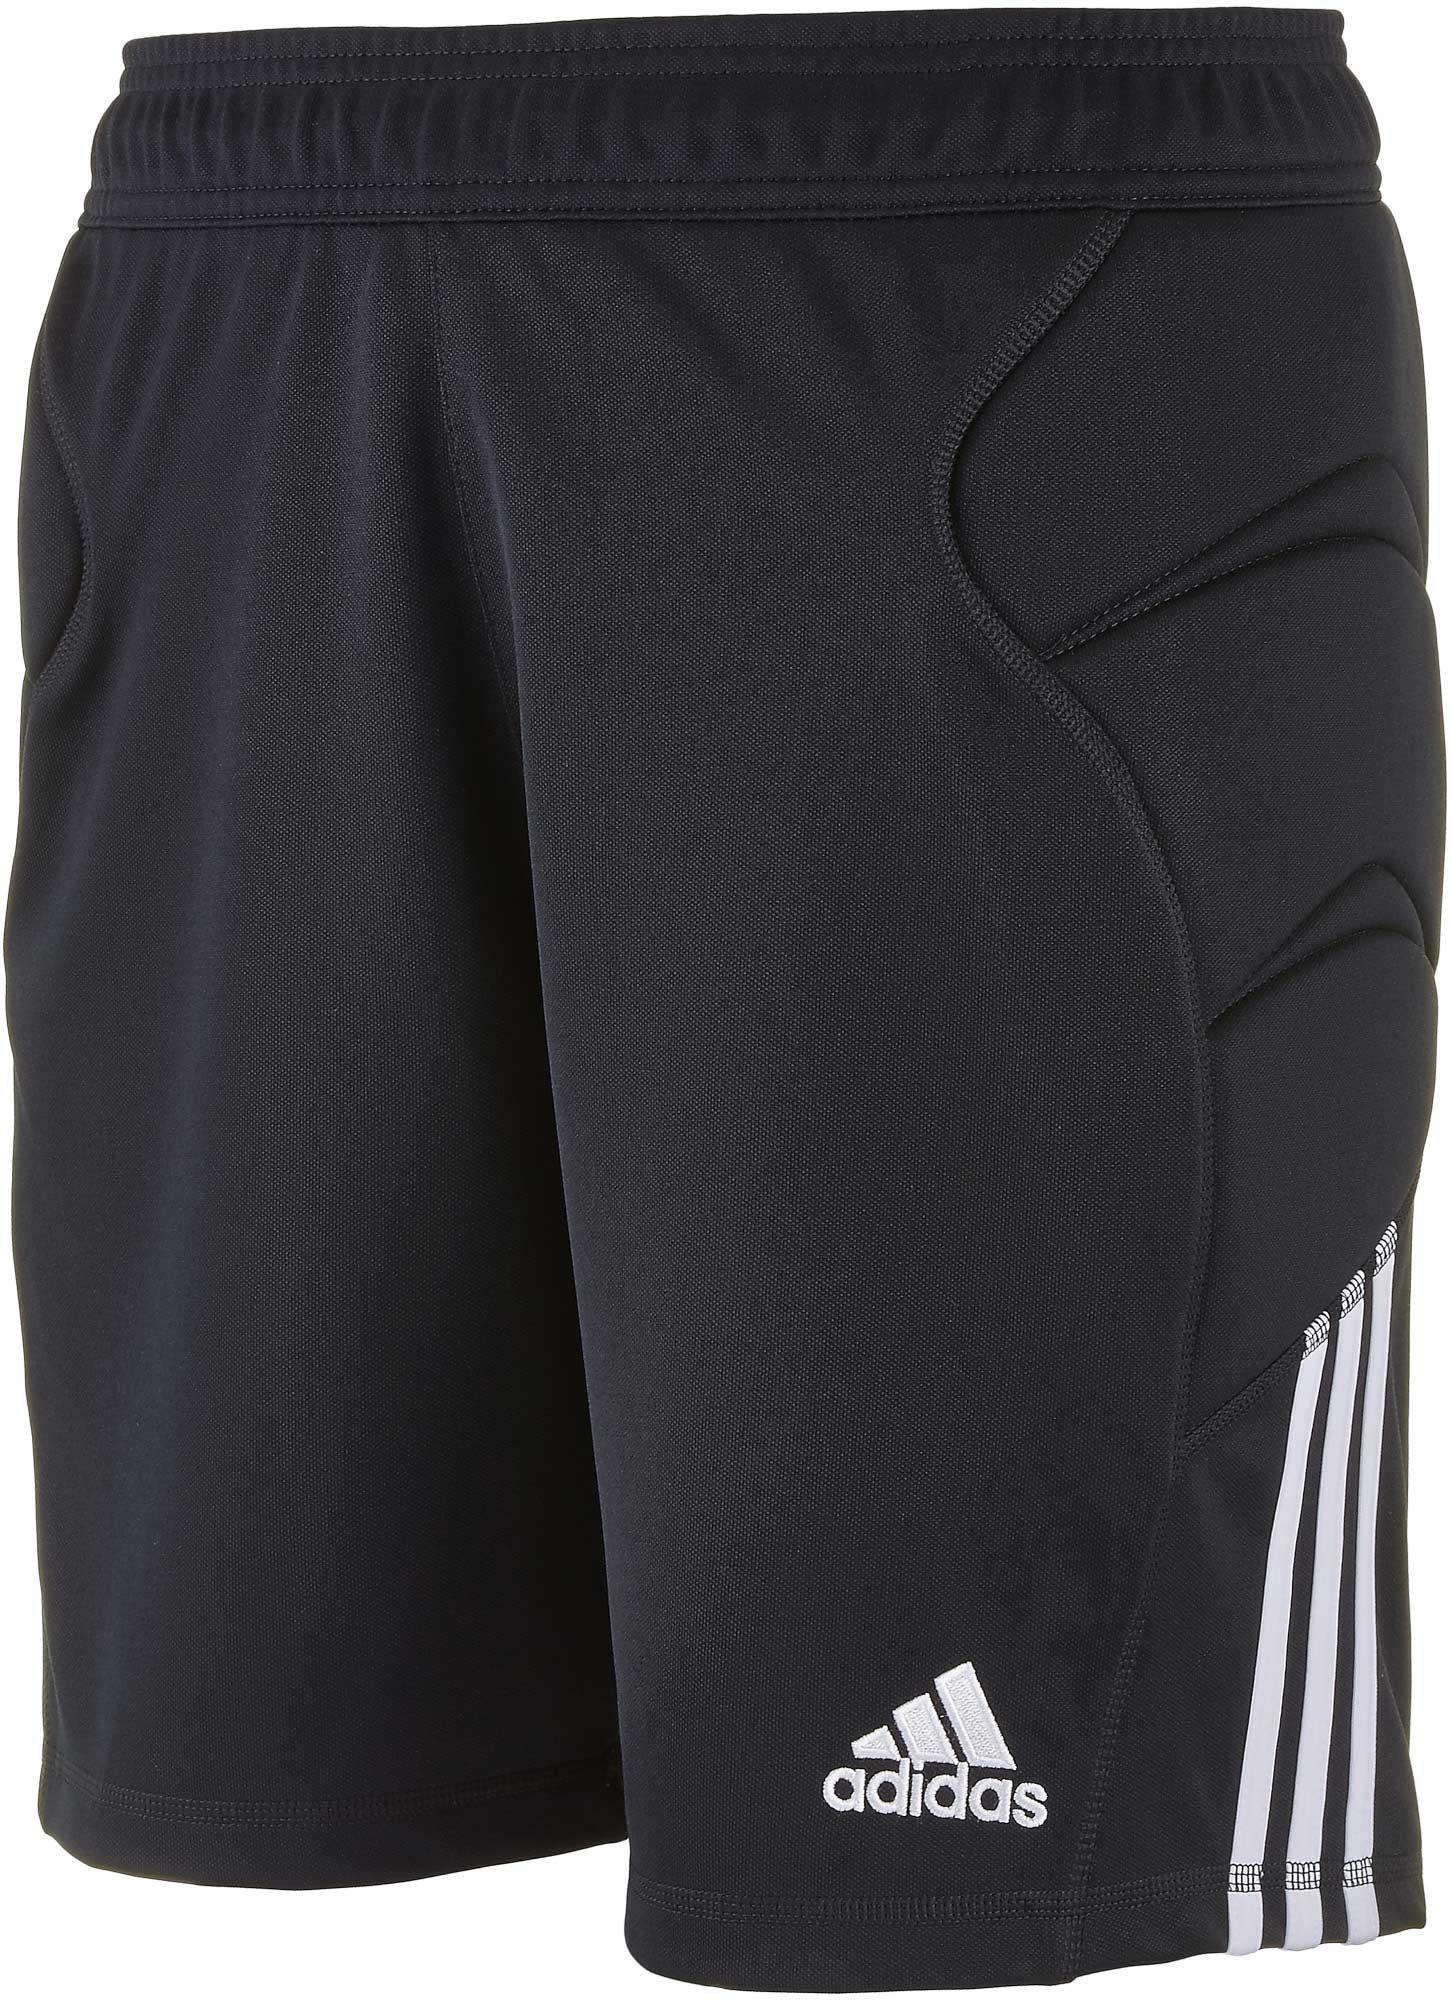 adidas Tierro 13 Goalkeeper Short Black